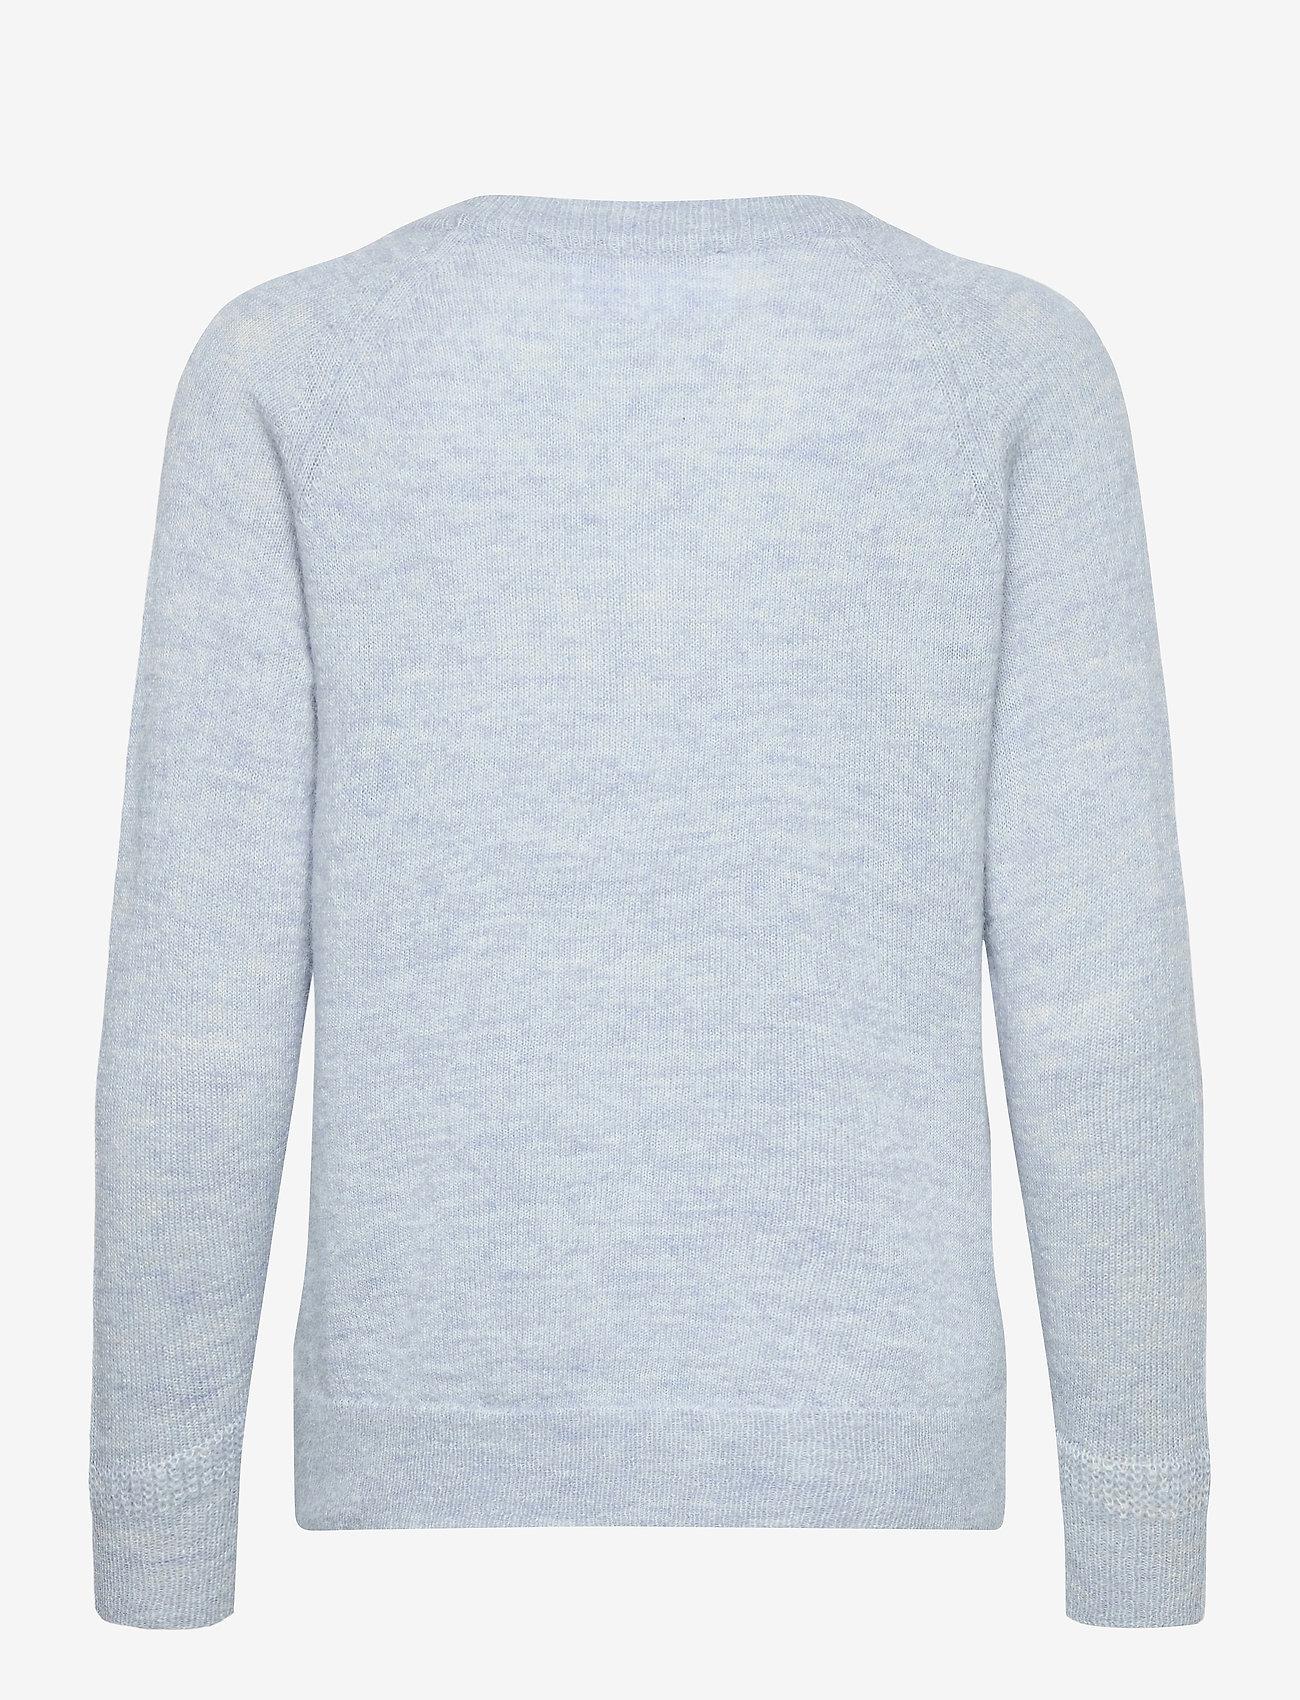 Selected Femme - SLFLULU LS KNIT O-NECK - truien - cashmere blue - 1